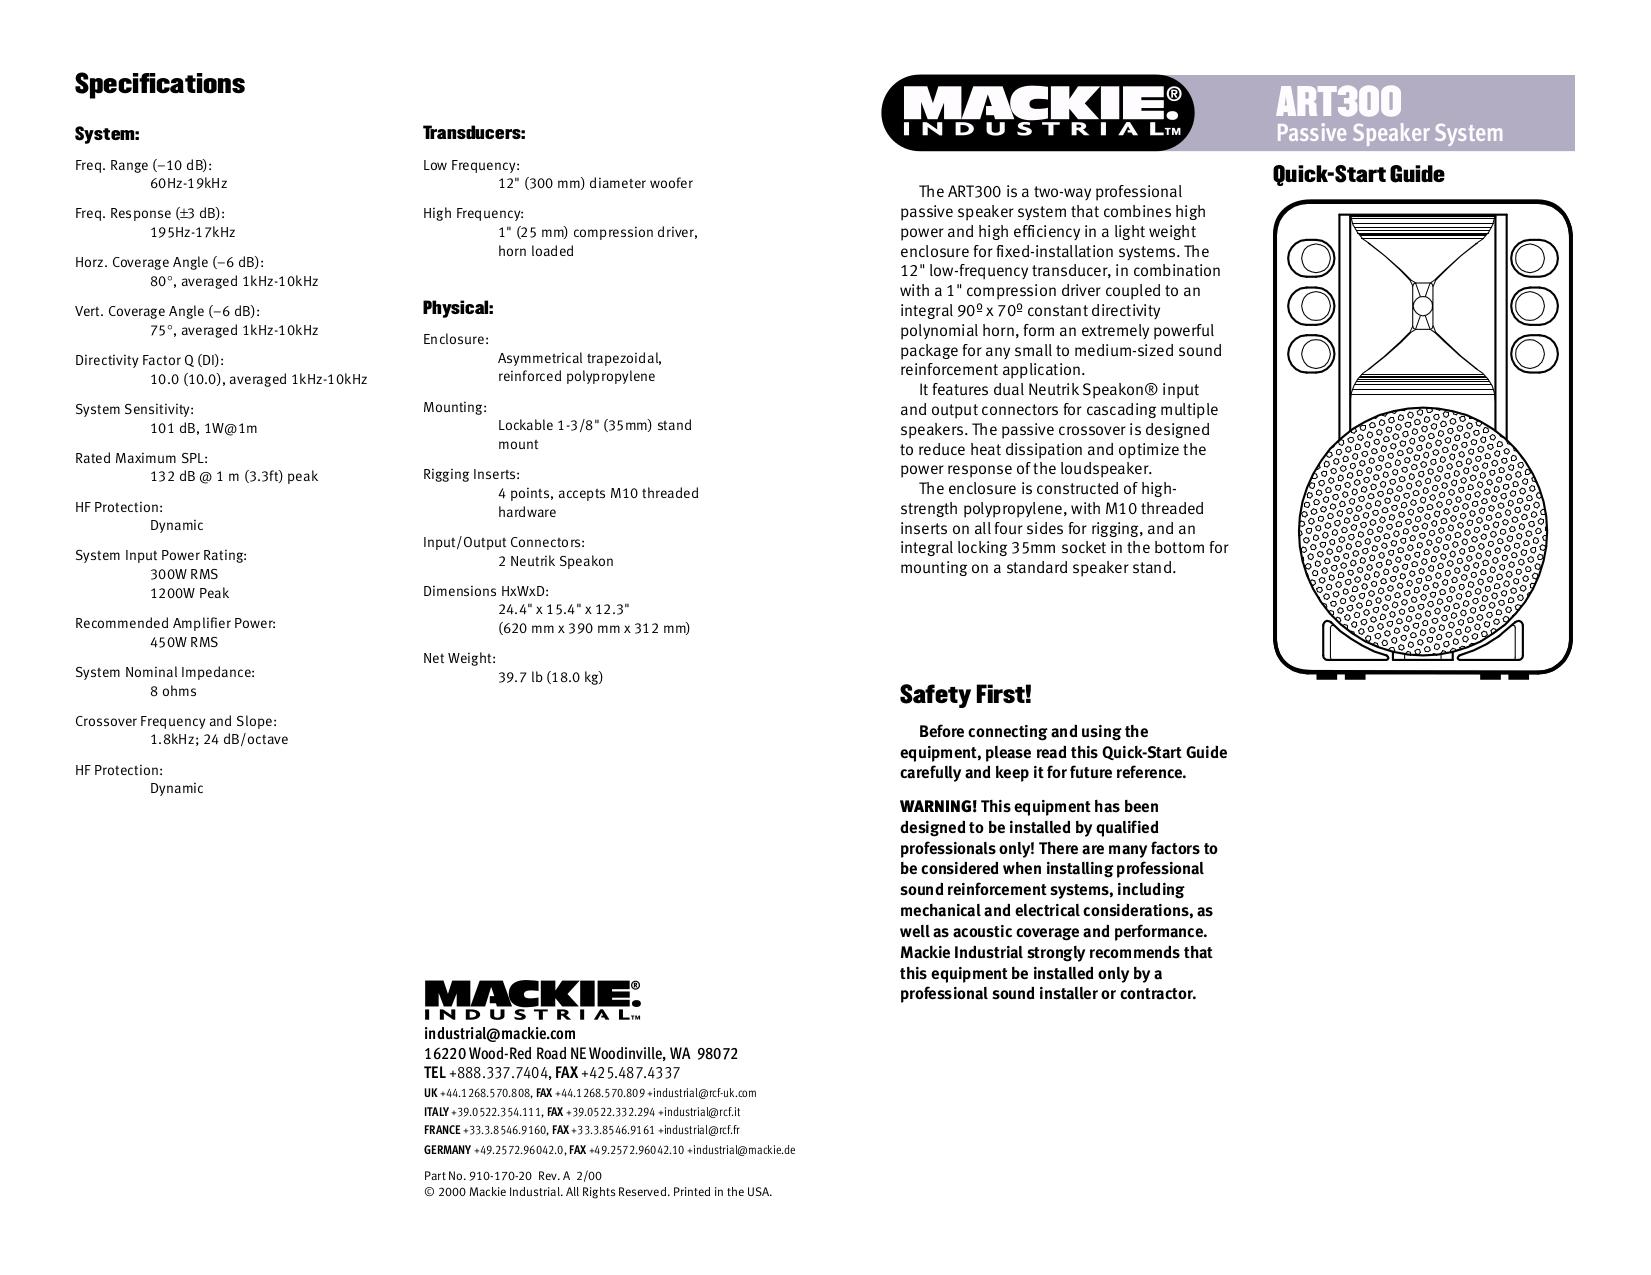 pdf for Mackie Speaker System Art Series ART300A manual